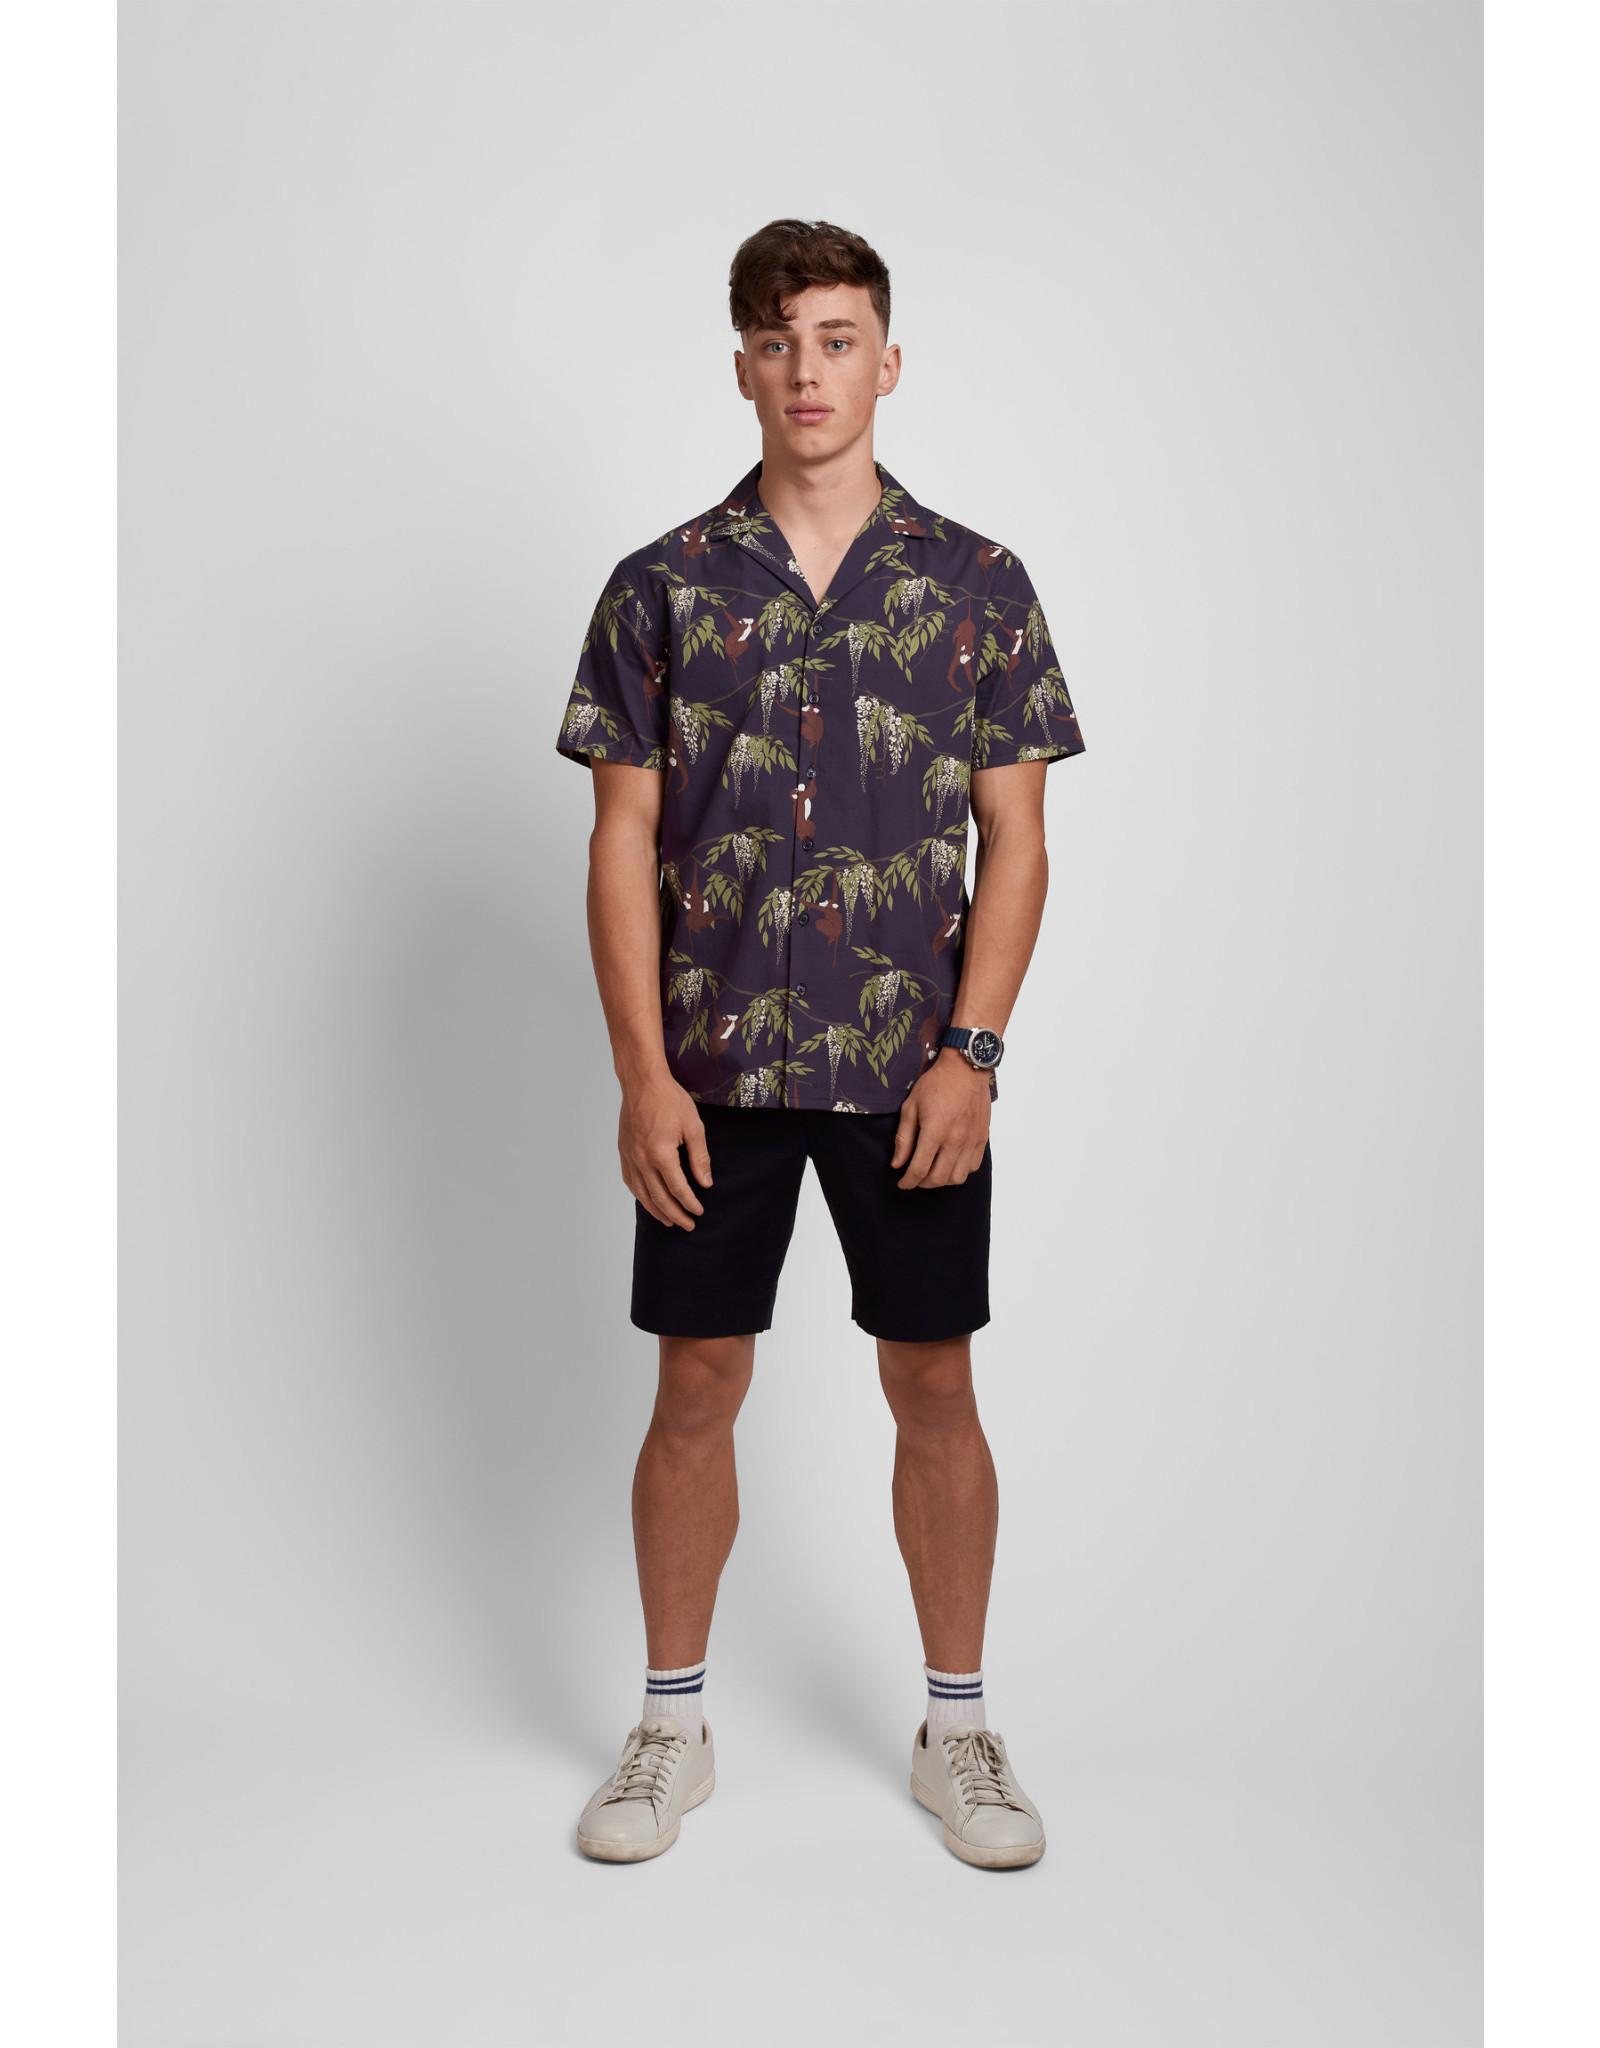 PCO - Chimp S/S Shirt